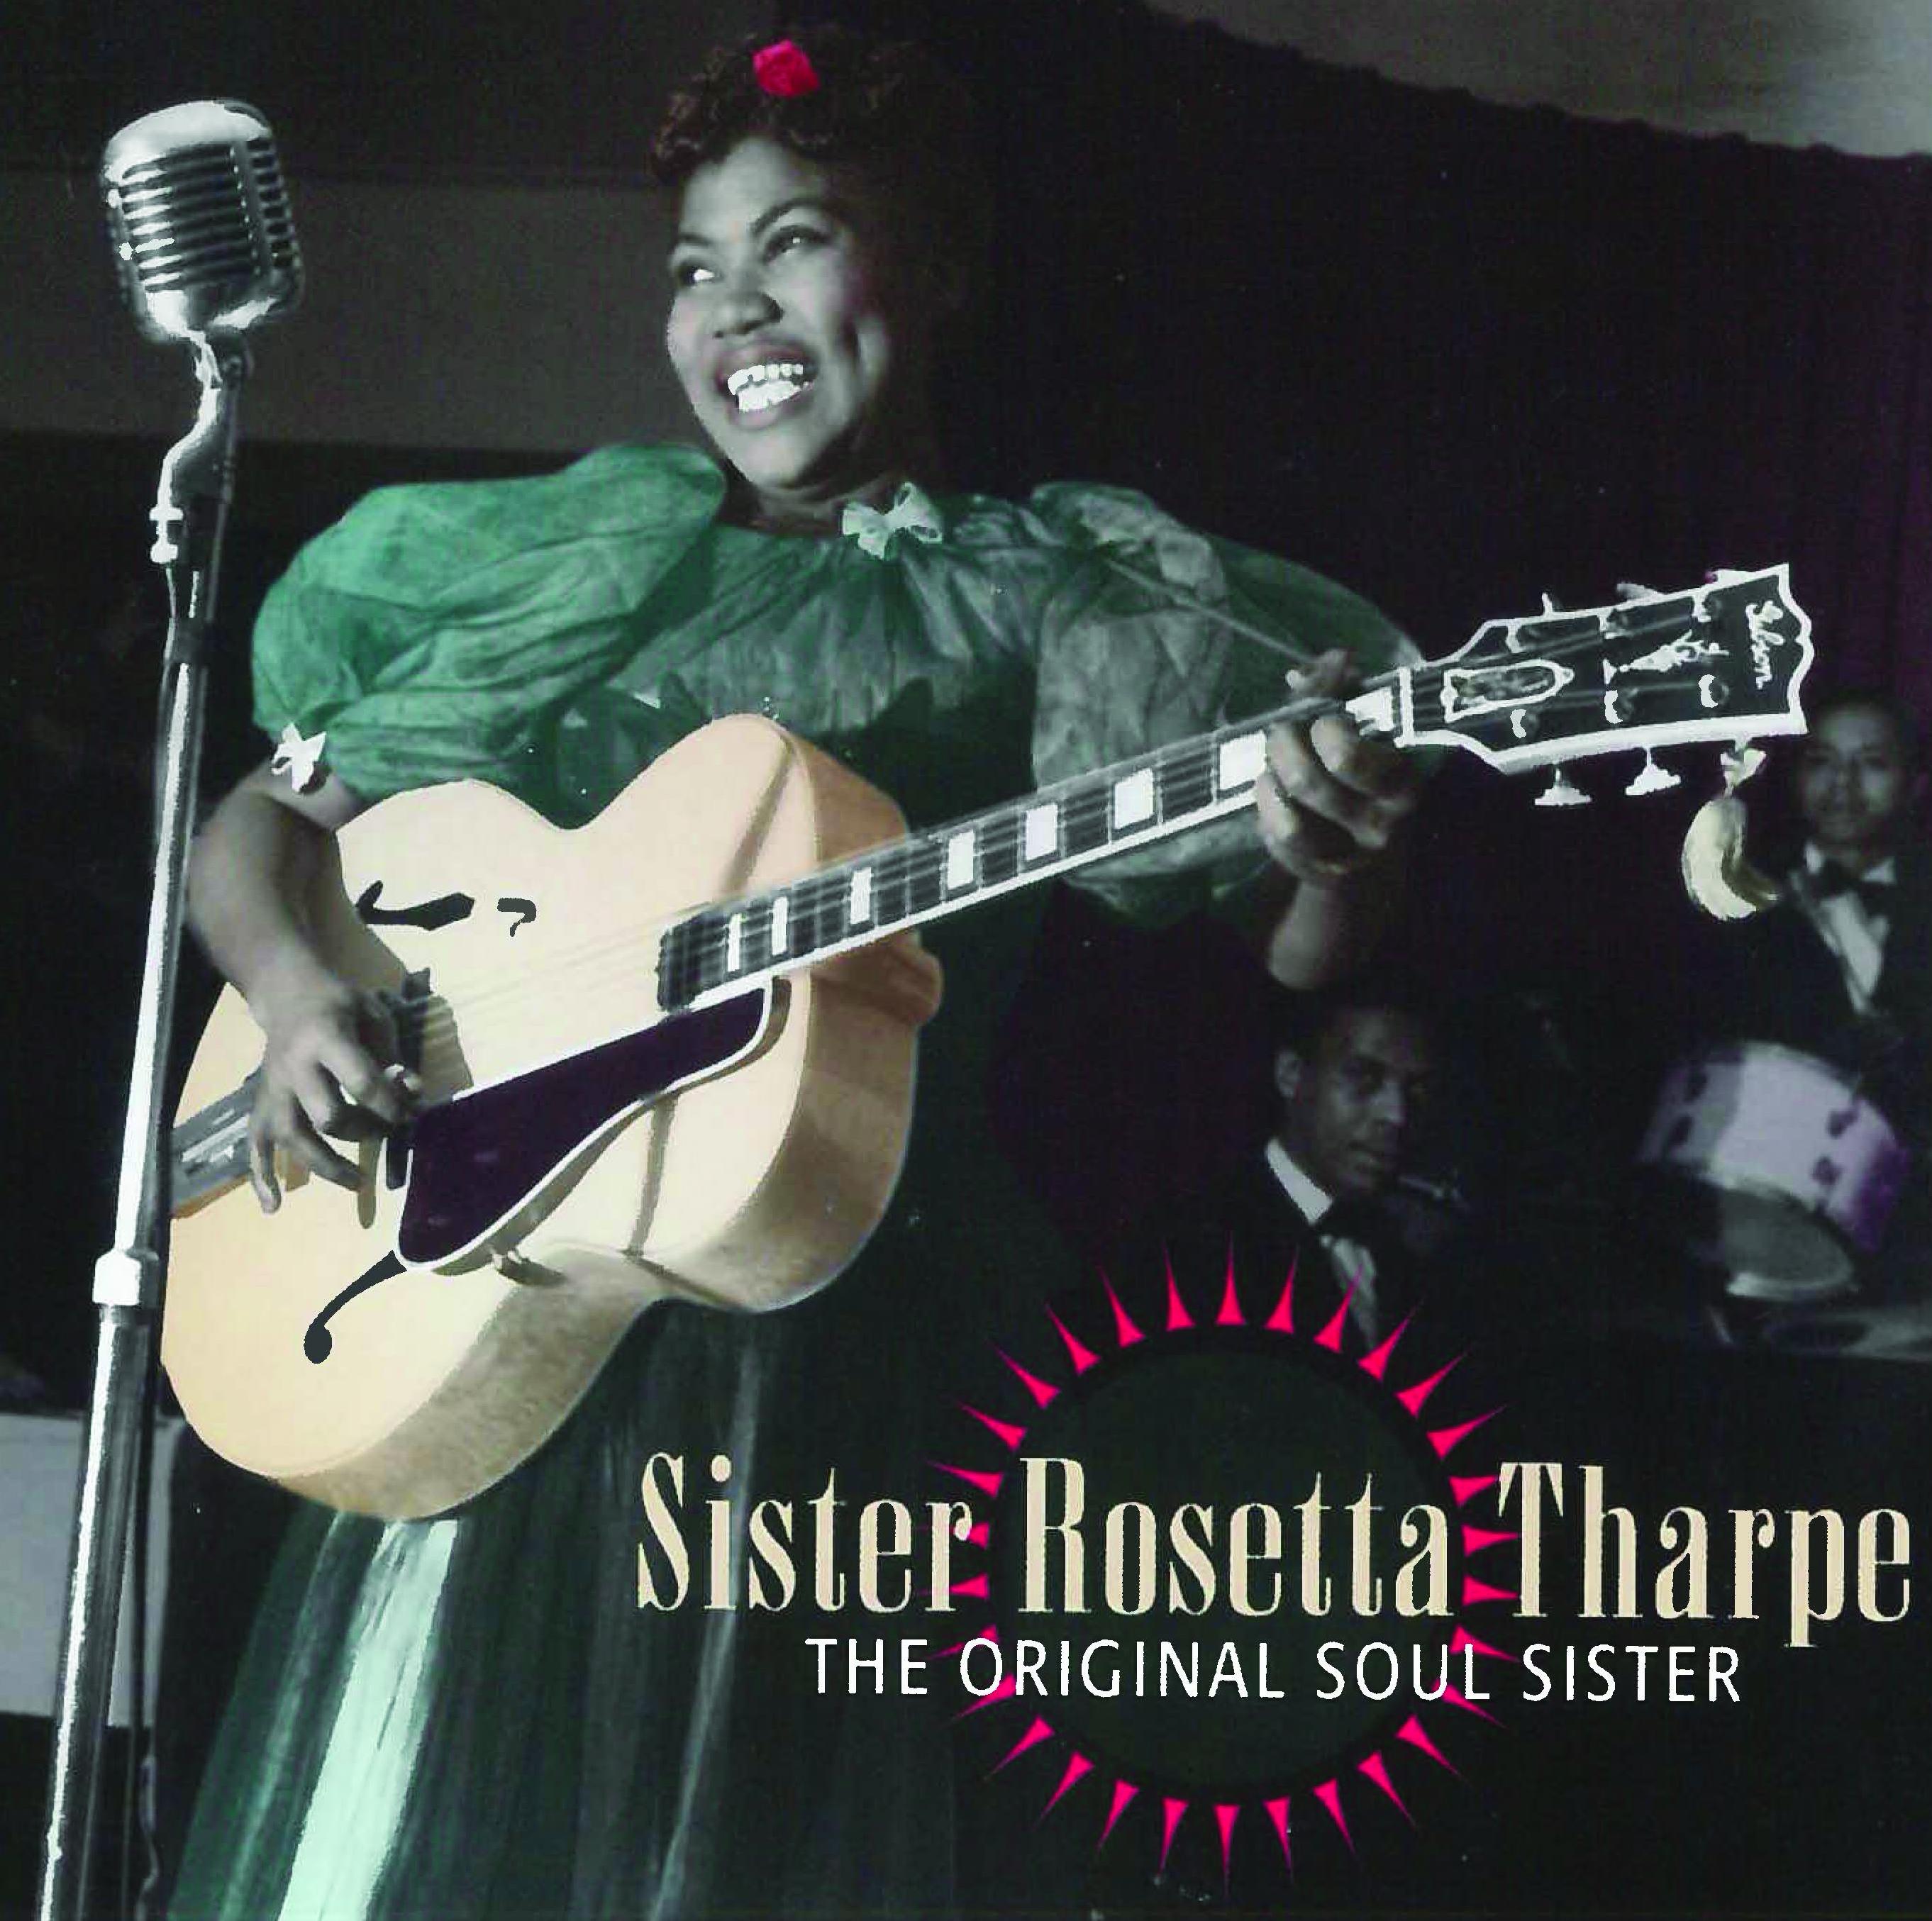 Cassidy hustler listen